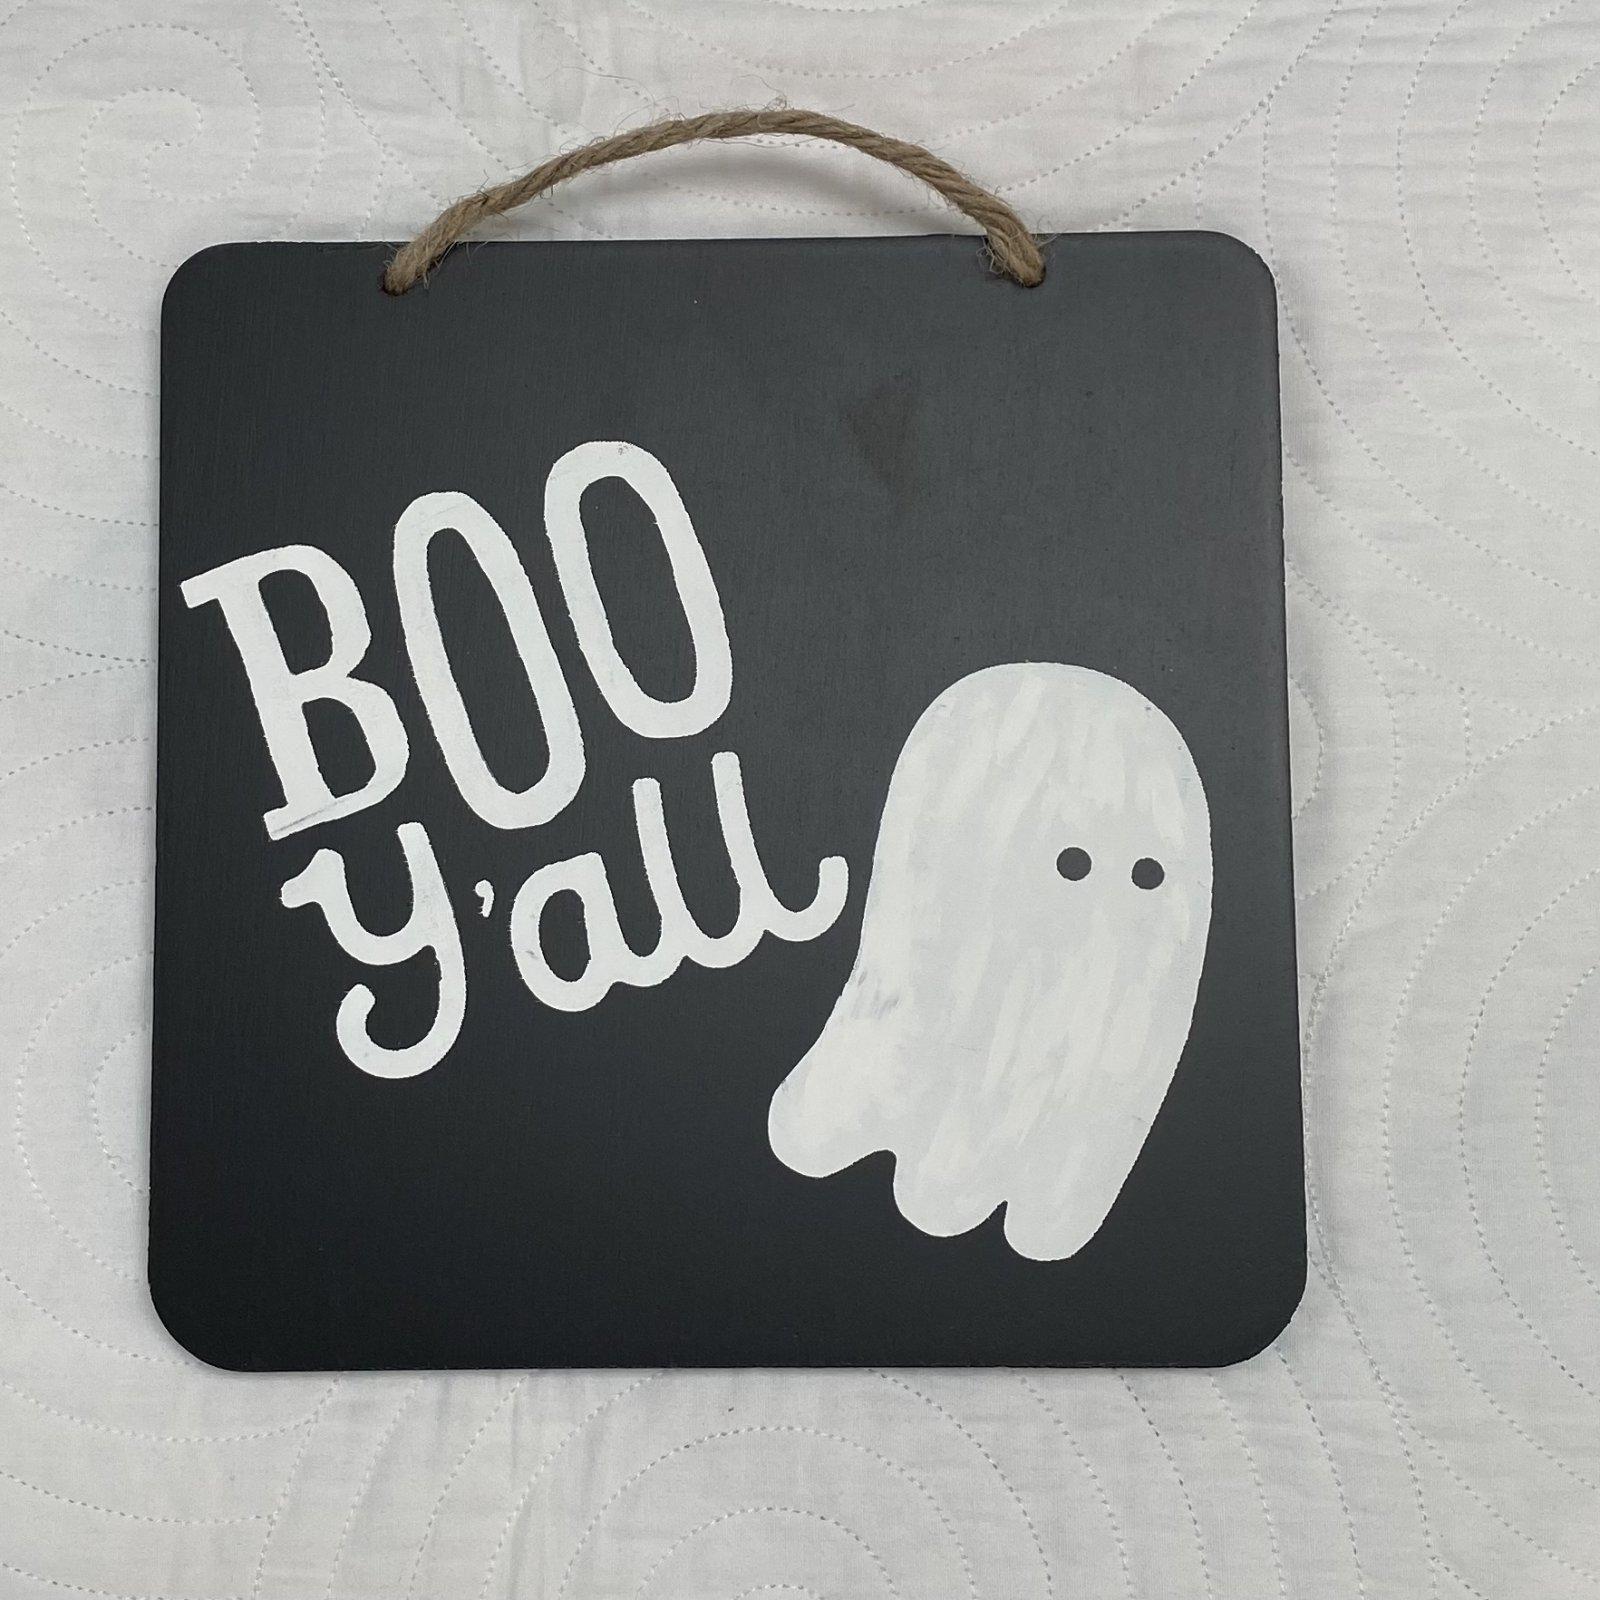 Boo Yall